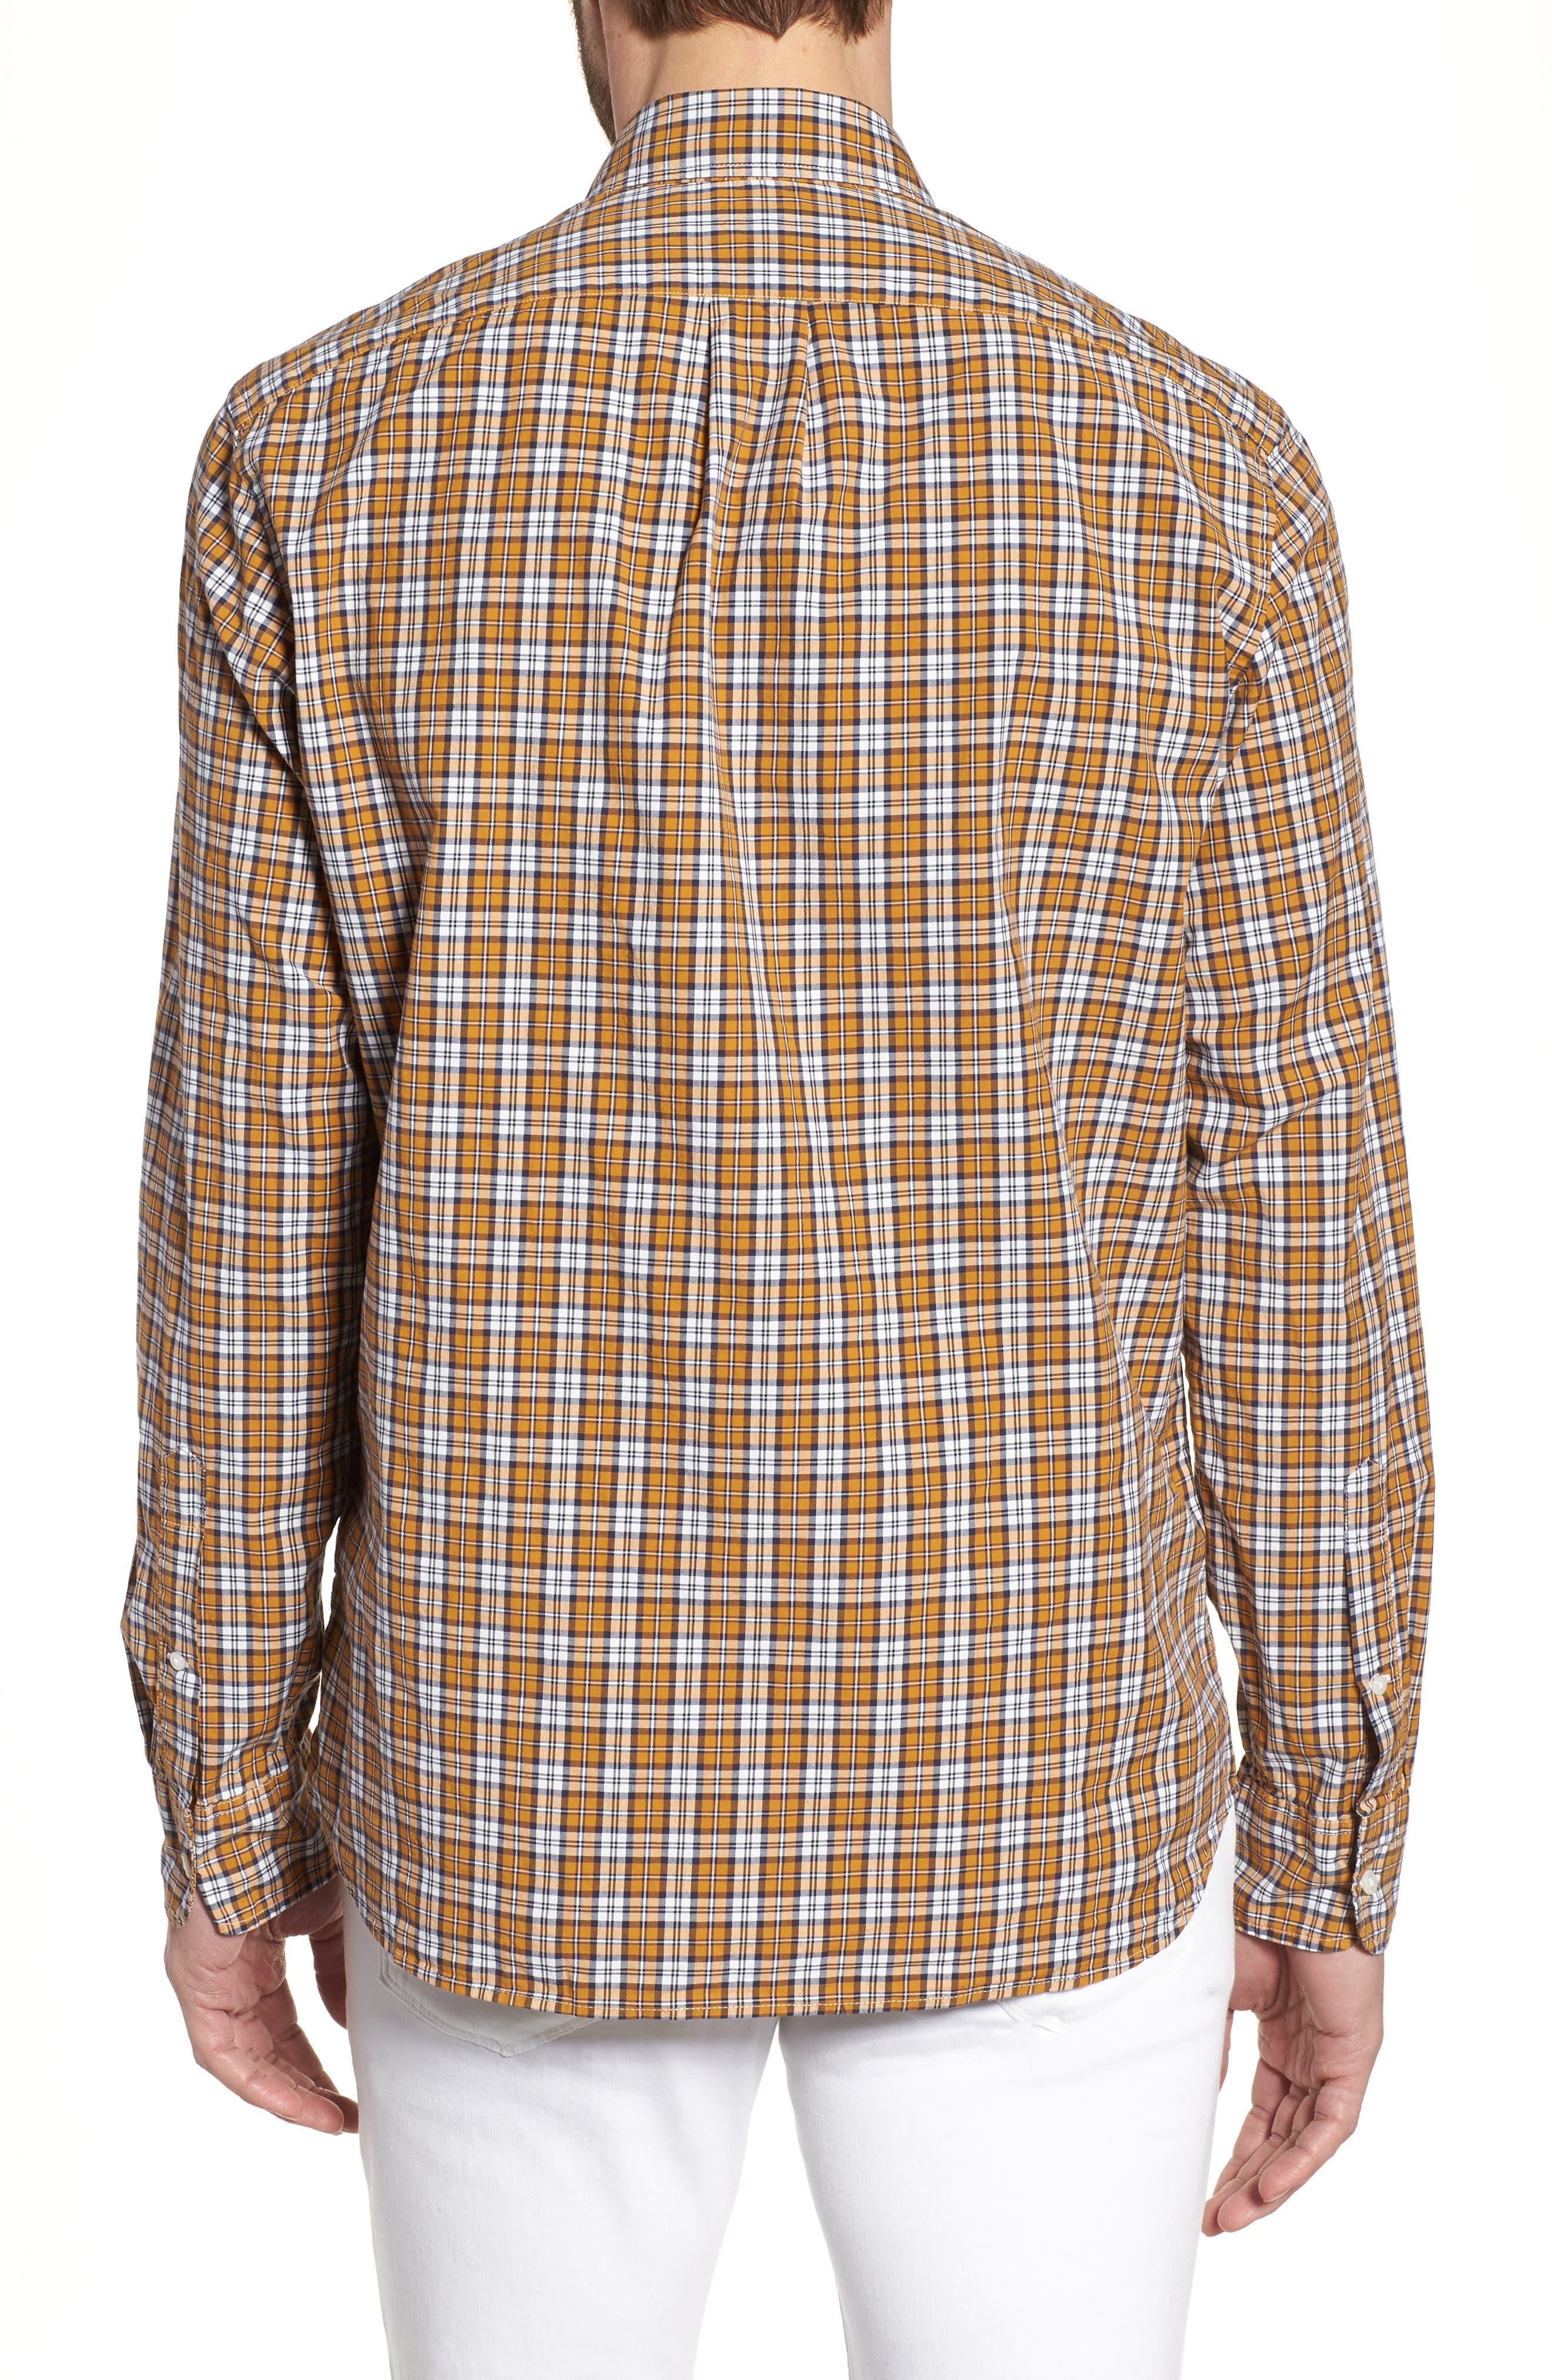 J.Crew Slim Fit Stretch Secret Wash Plaid Sport Shirt,                             Alternate thumbnail 2, color,                             Warm Cider